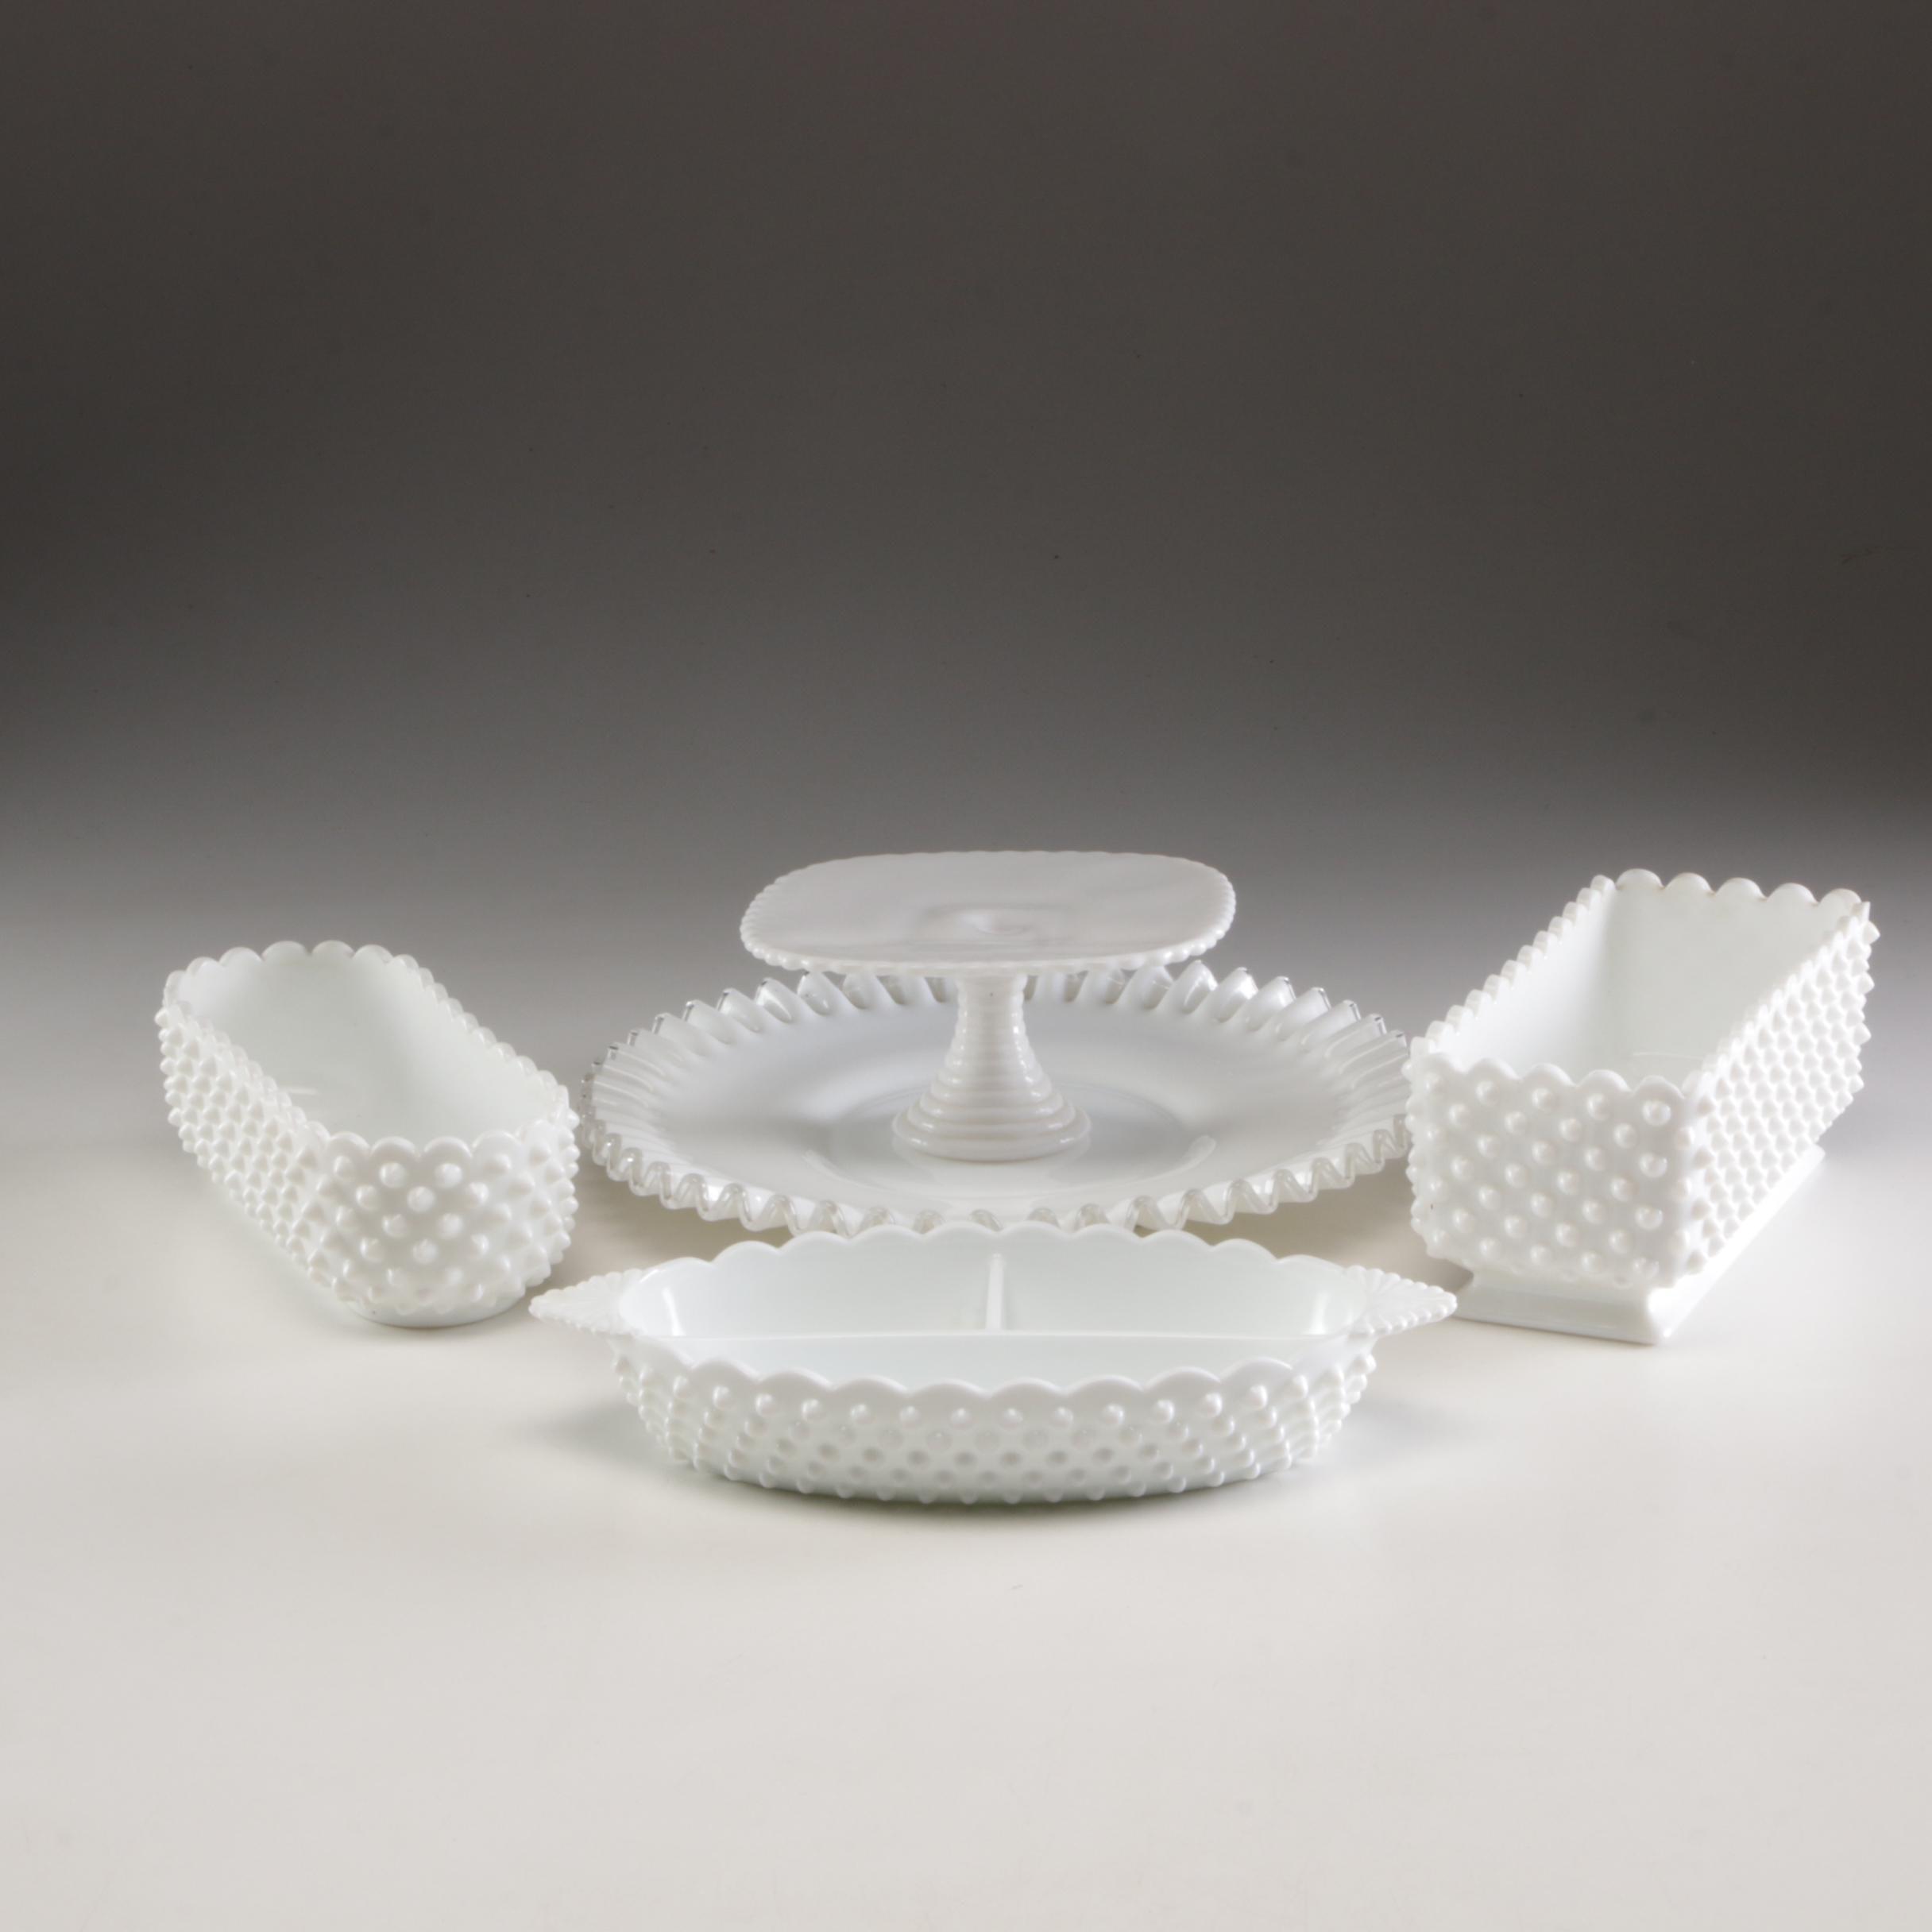 Grouping of Fenton Milkglass Hobnail Tableware